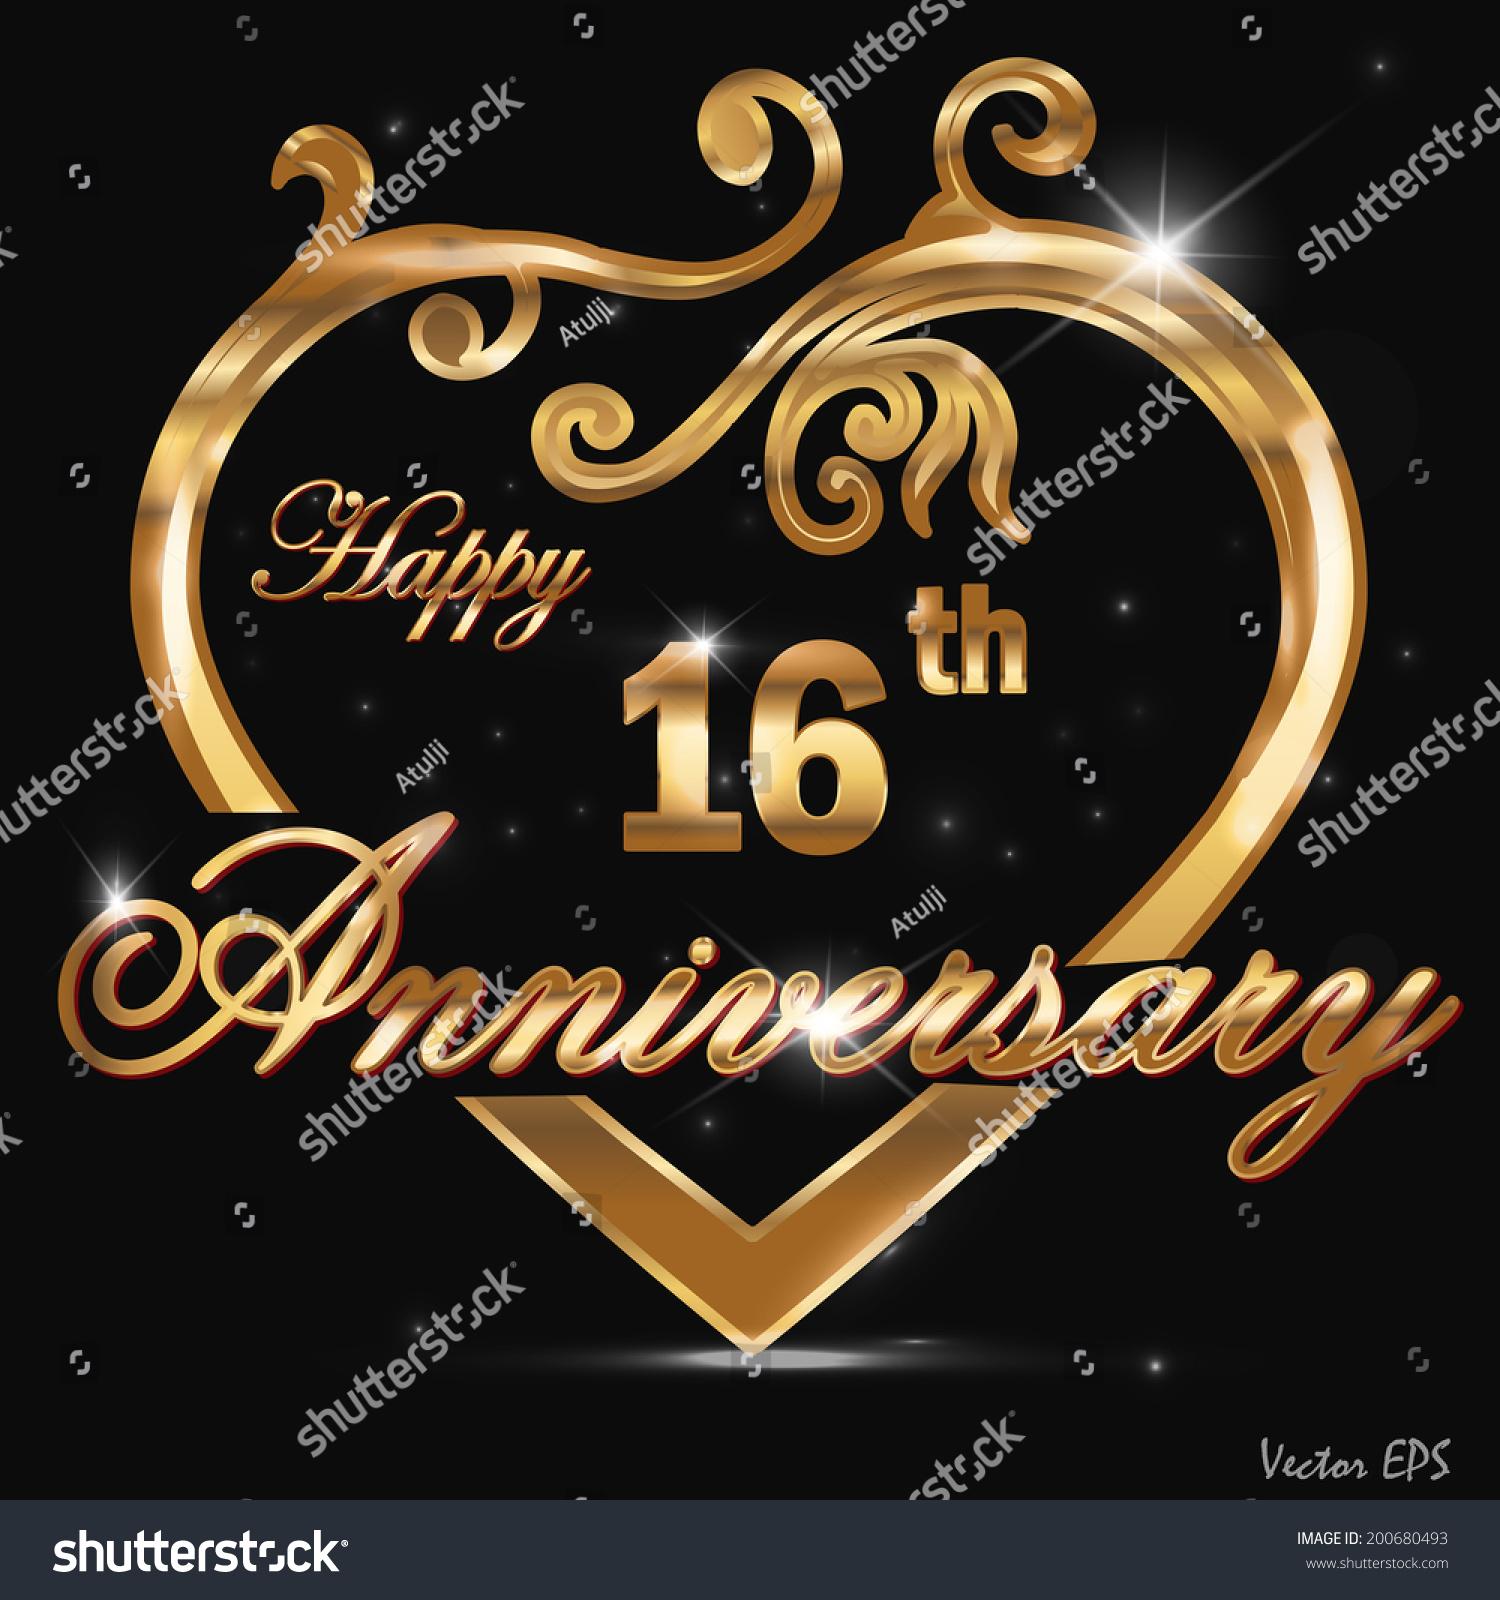 16 year anniversary golden heart, 16th… Stock Photo